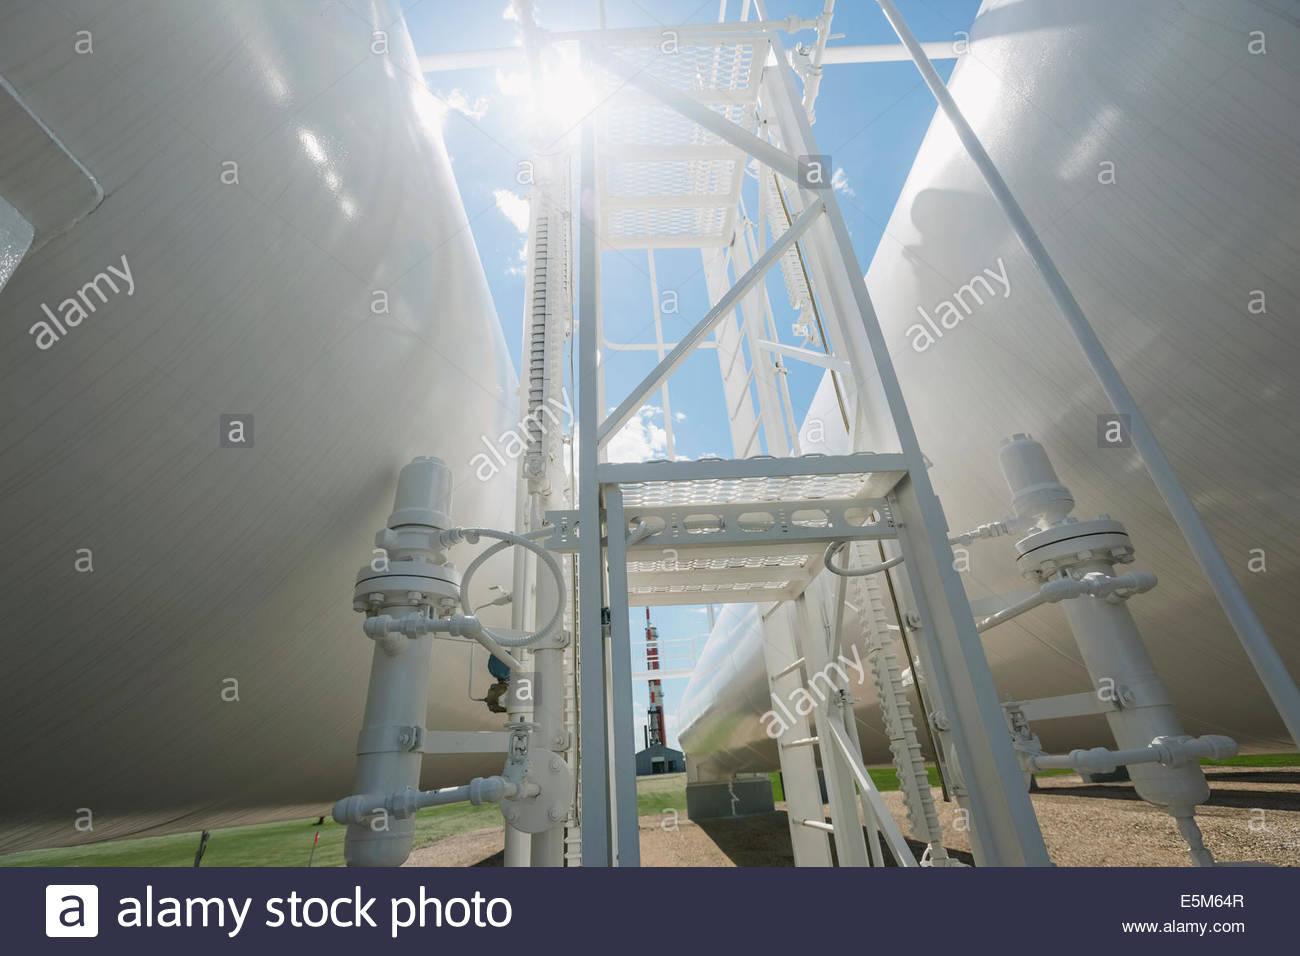 Sun shining over natural gas tanks - Stock Image